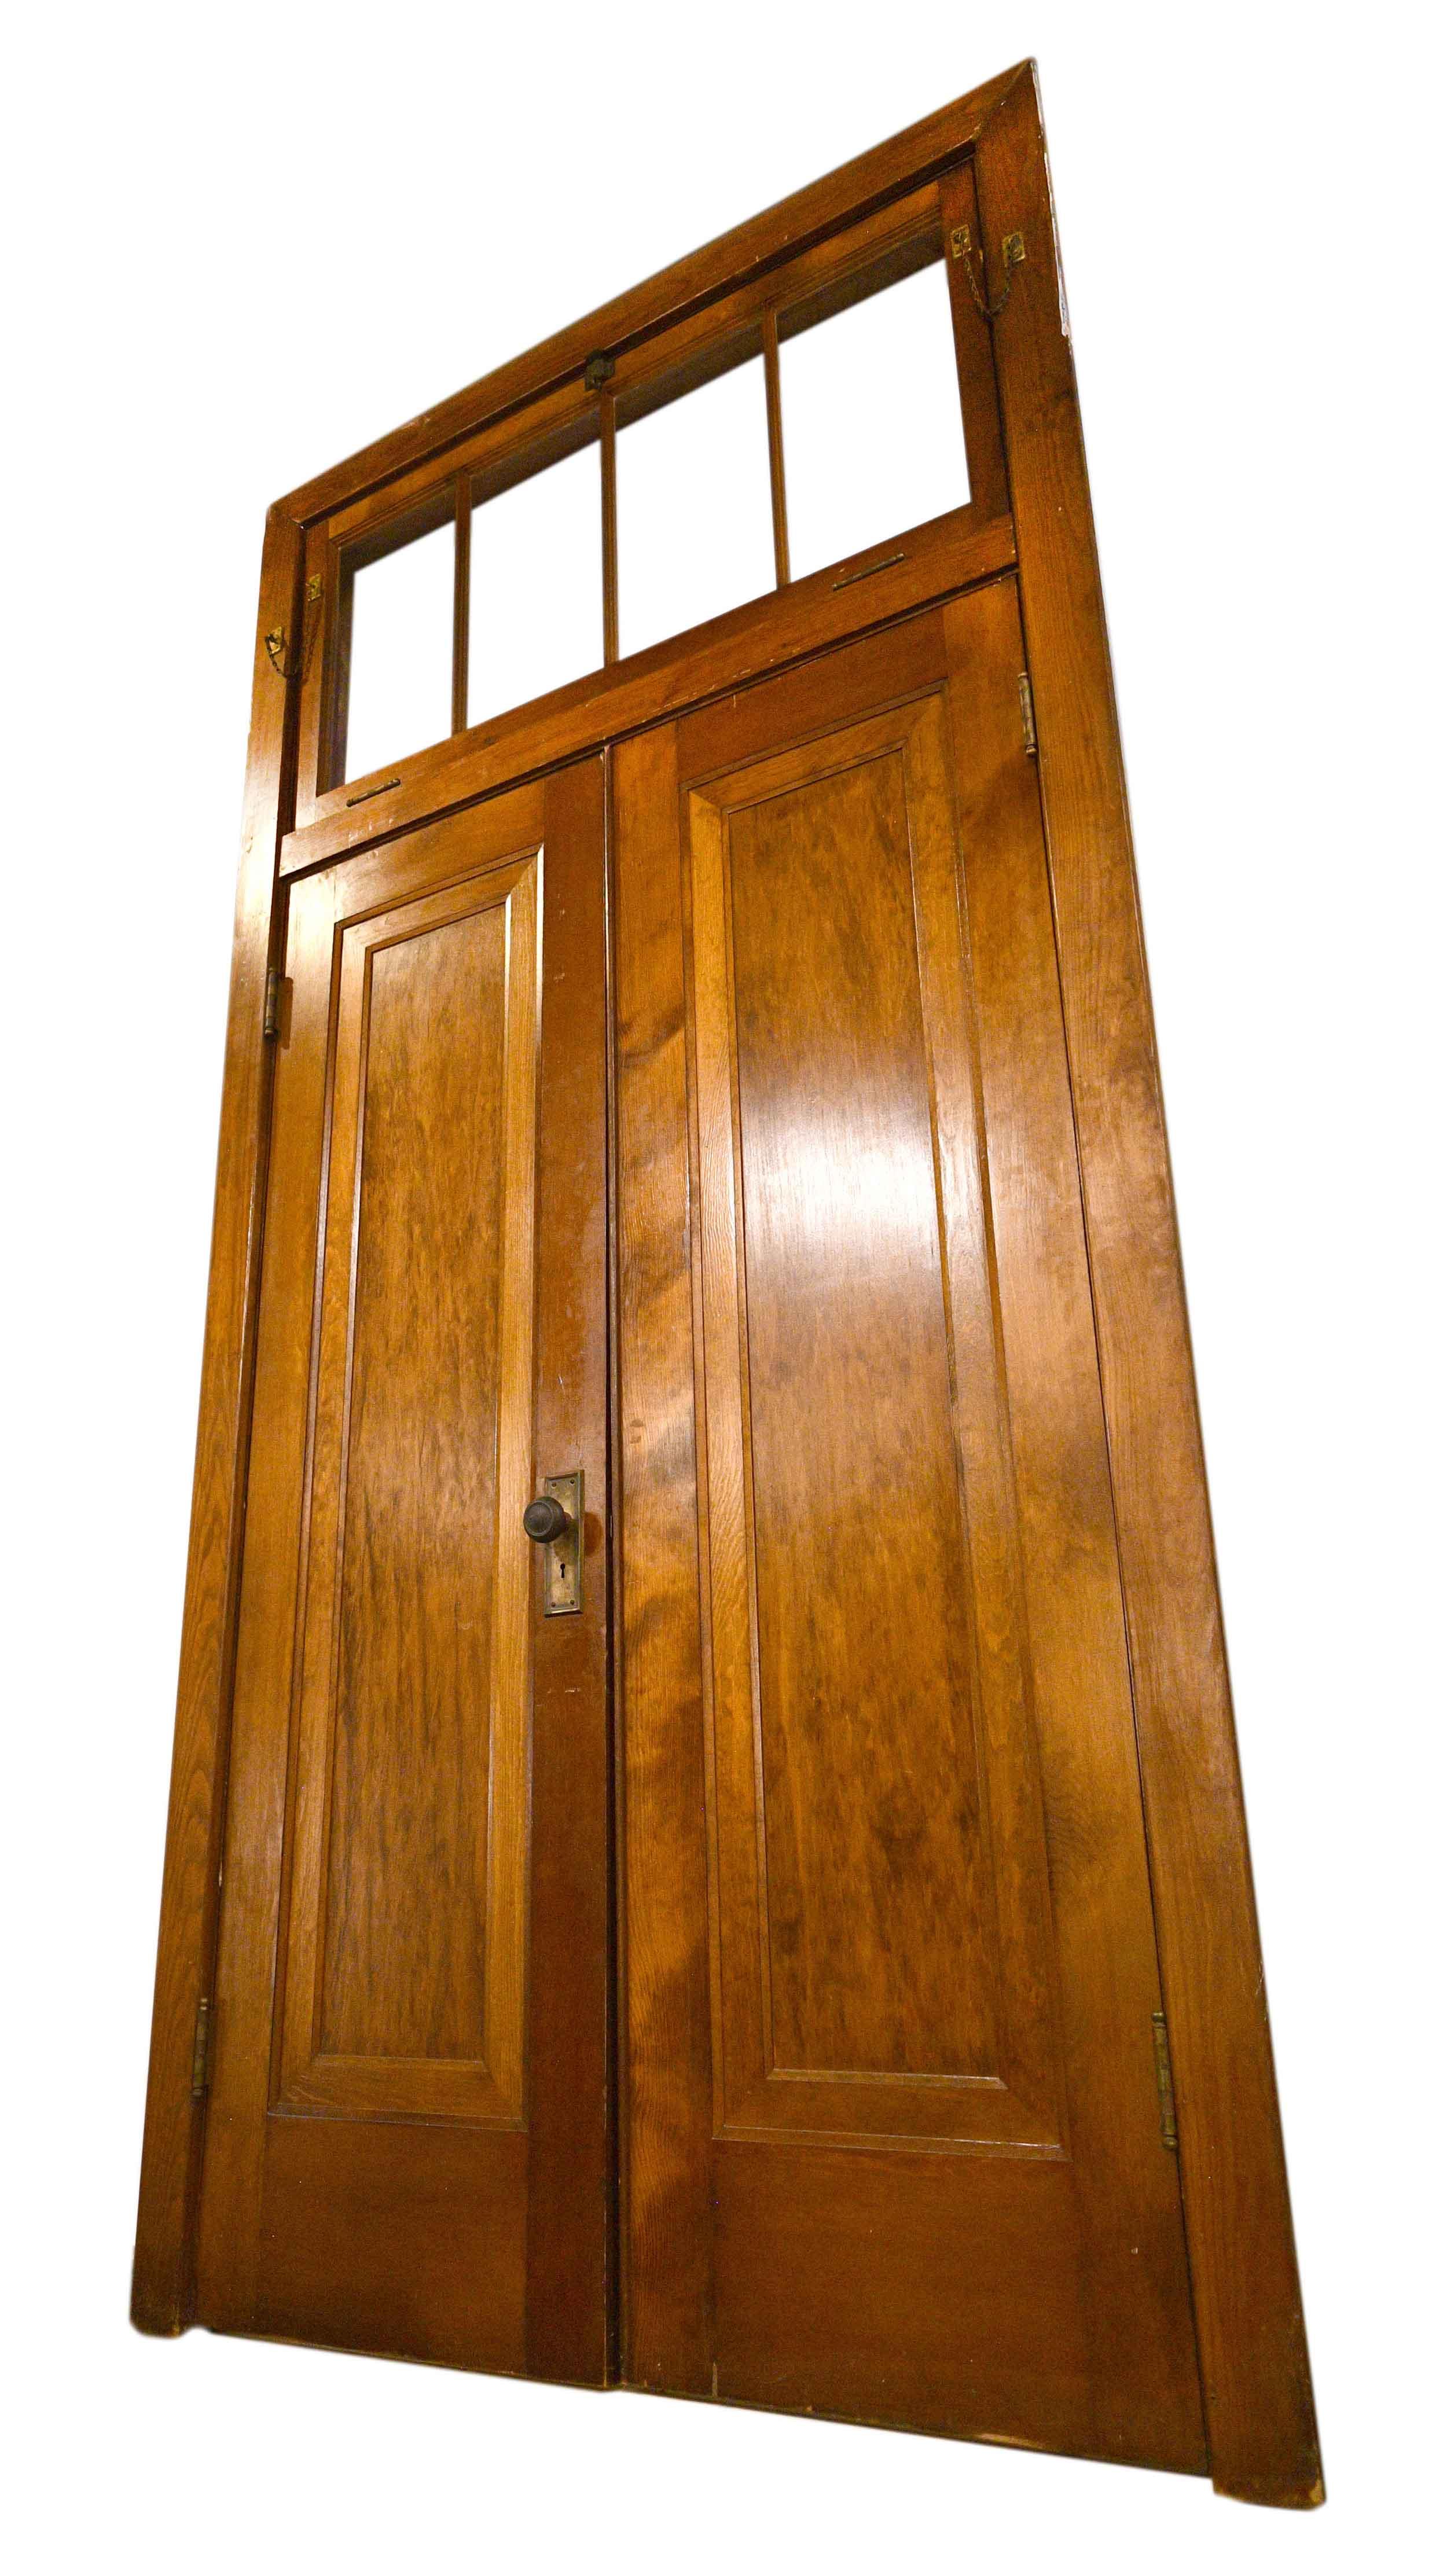 door-with-transom-2.jpg